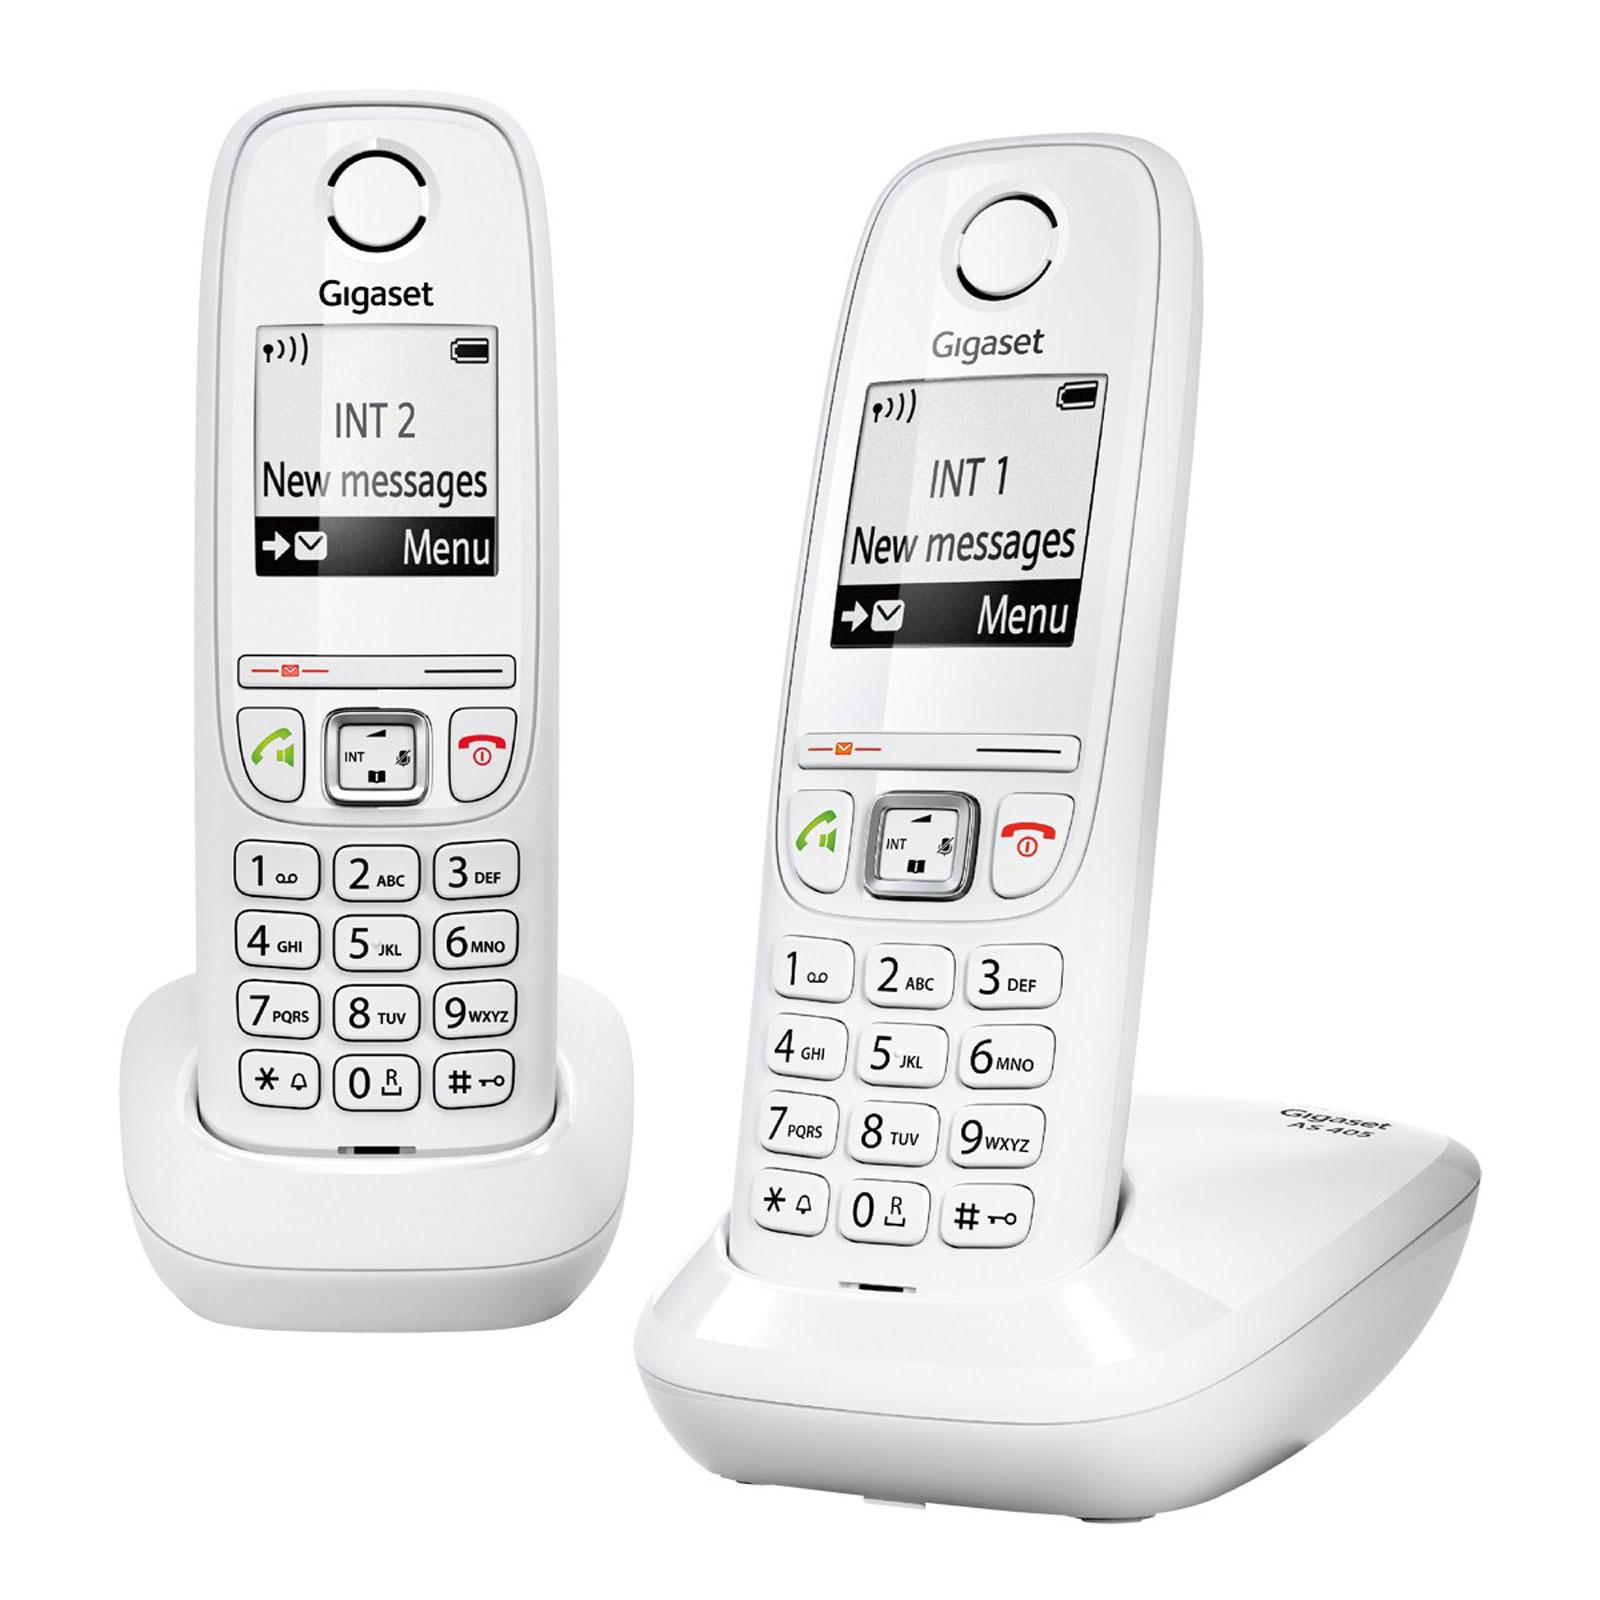 gigaset as405 duo blanc t l phone sans fil gigaset sur. Black Bedroom Furniture Sets. Home Design Ideas